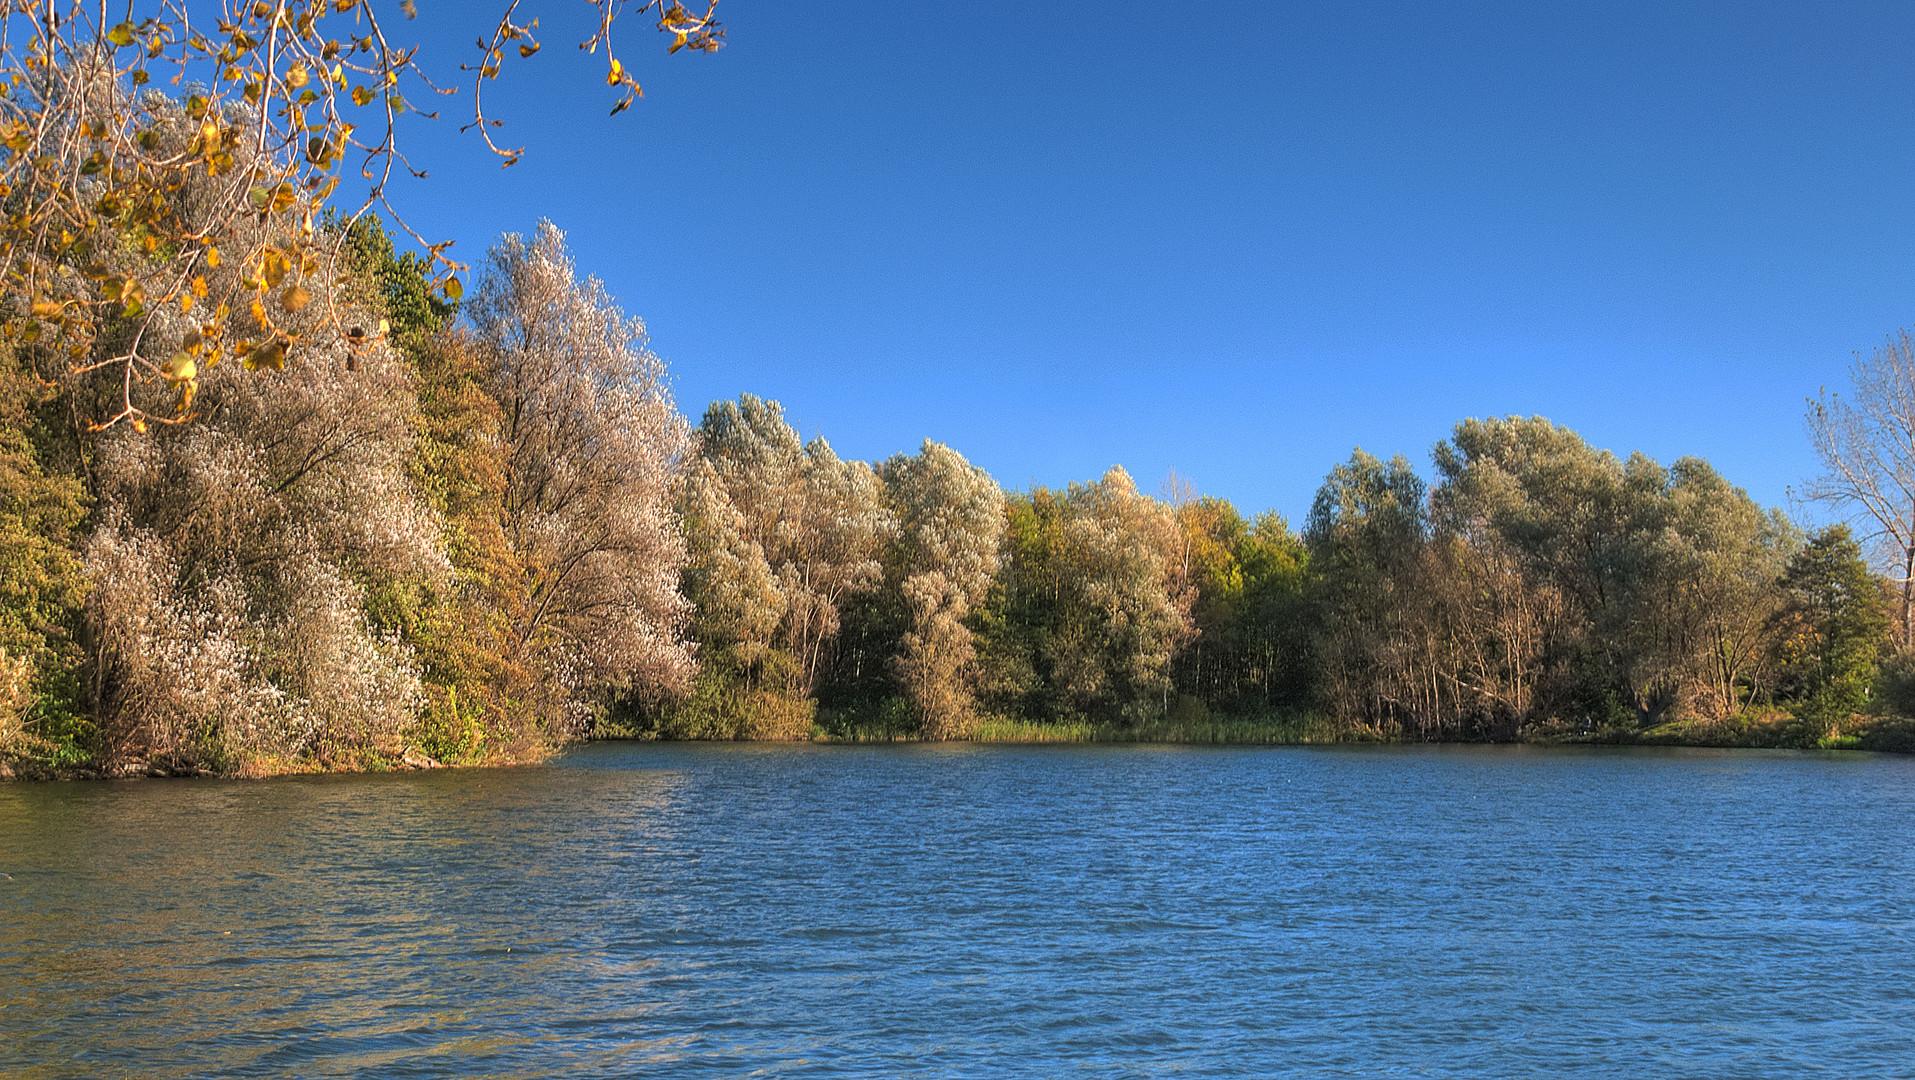 Goldener Oktober am Wilkenburgersee